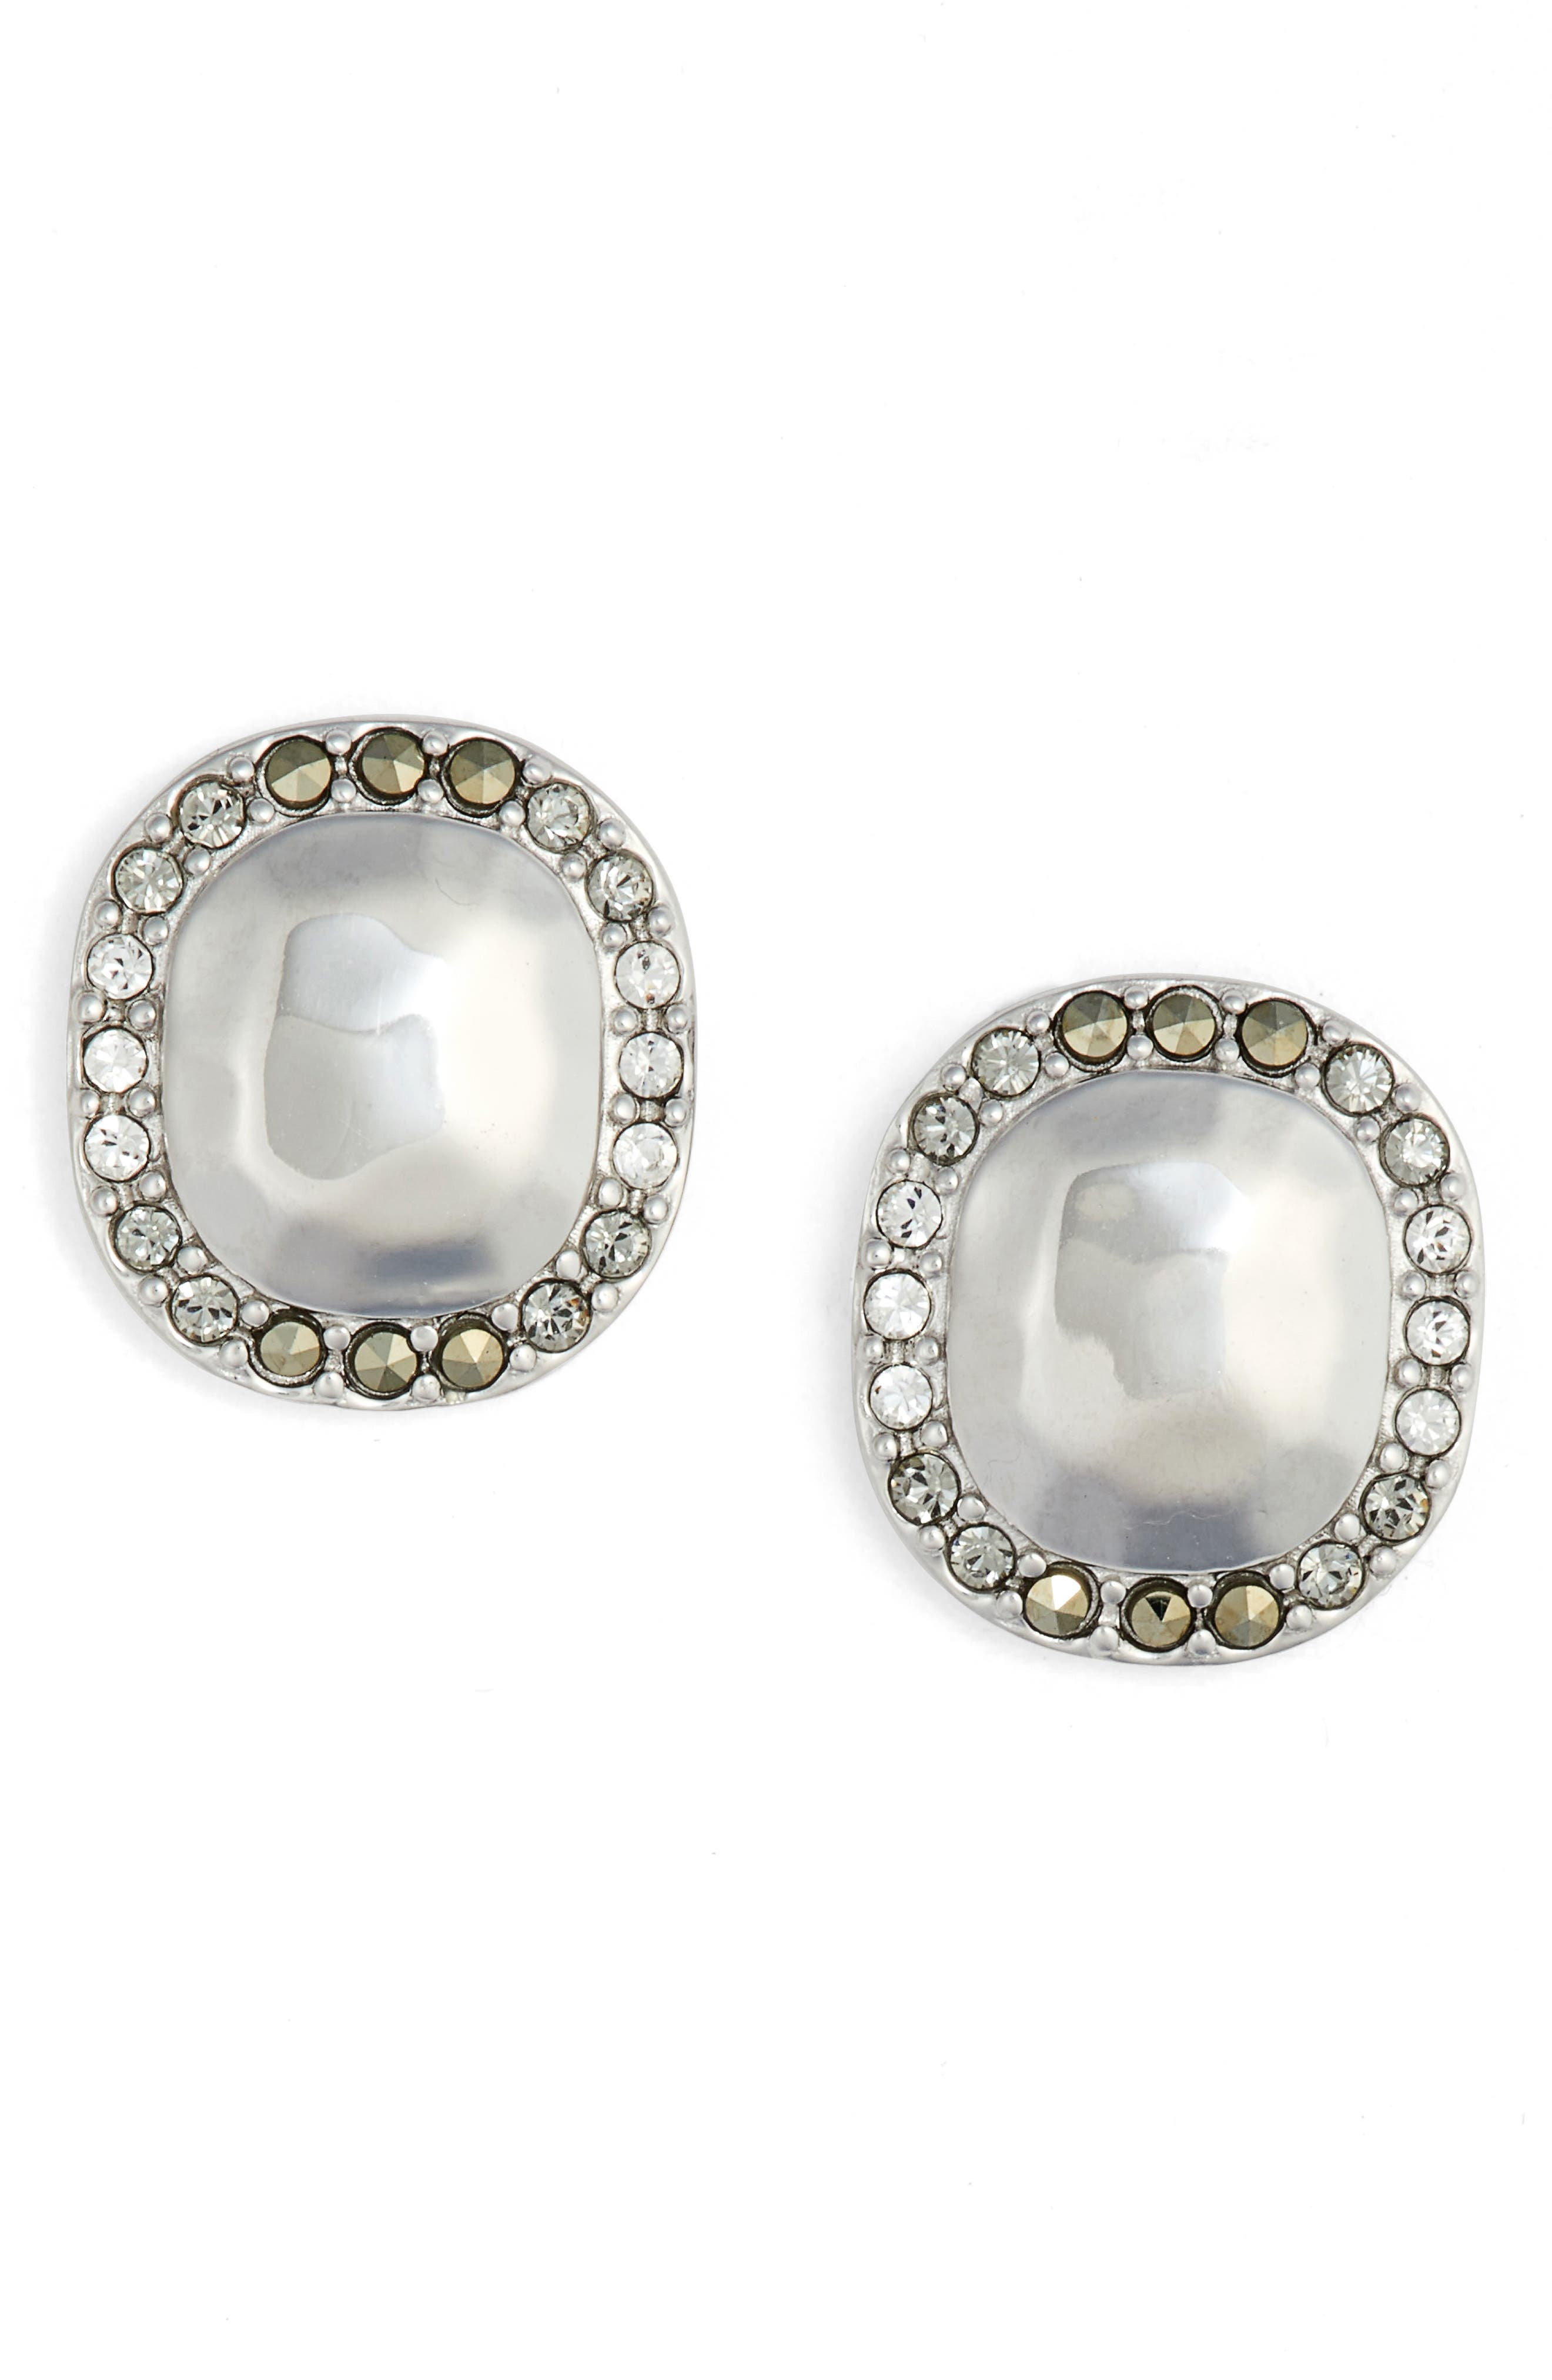 Judith Jack Jewel Stud Earrings